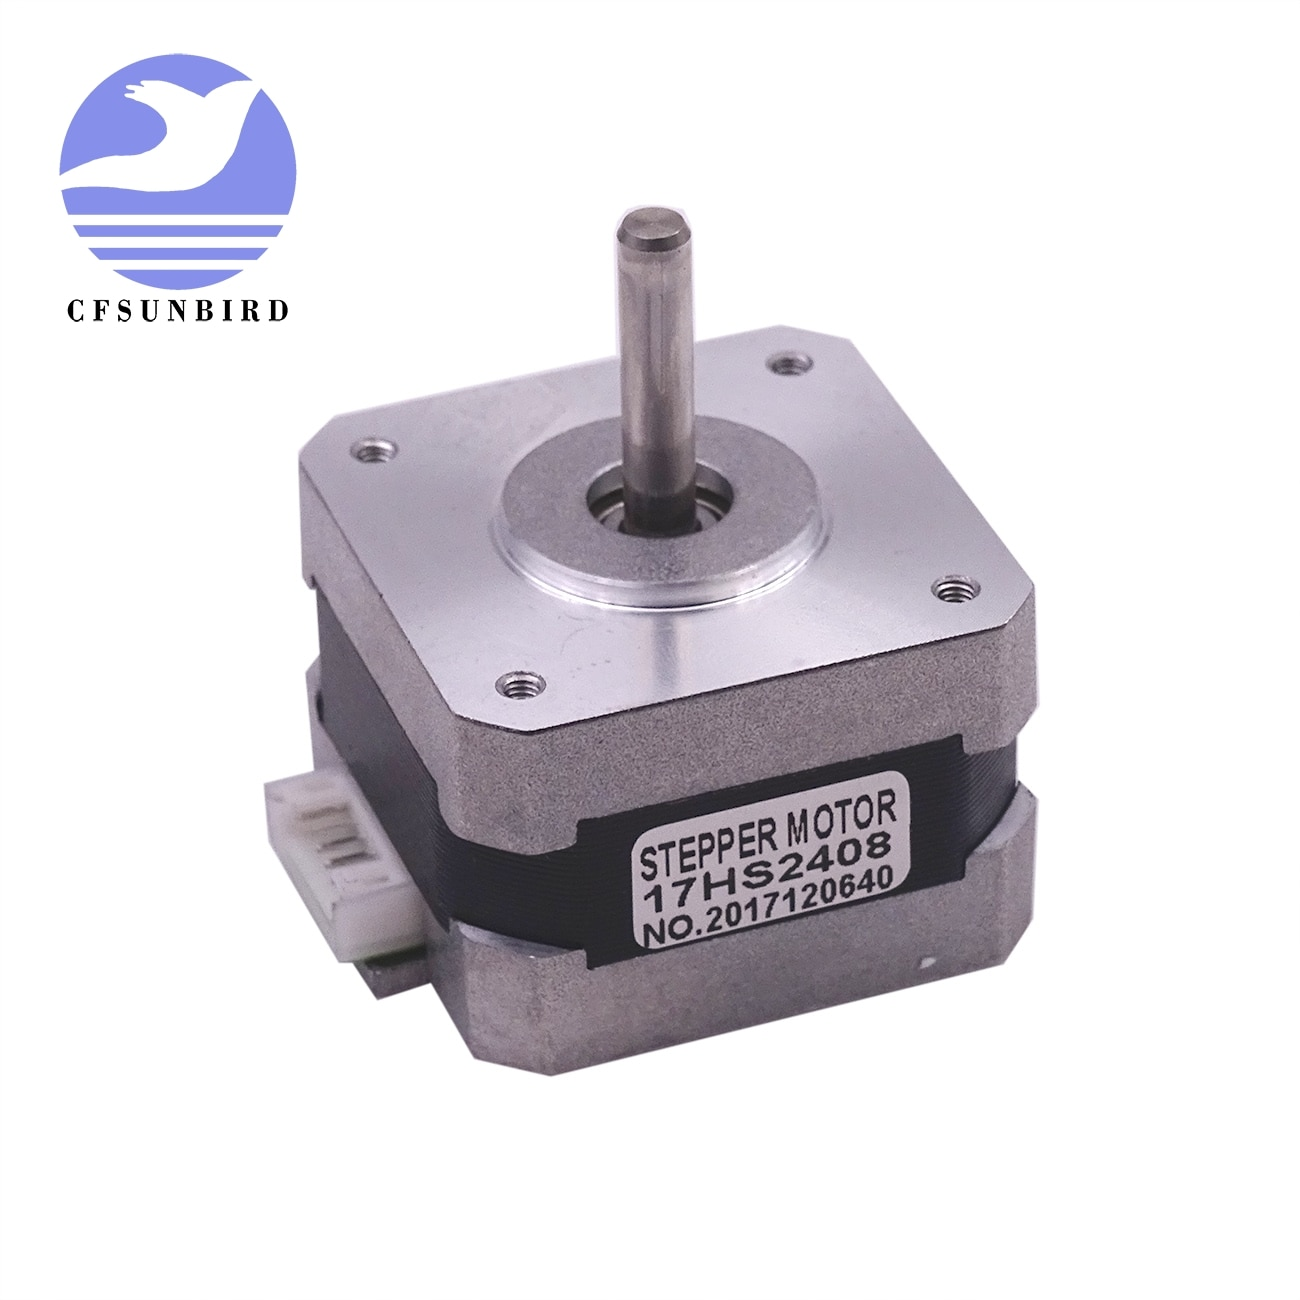 CE certification 1 PCS 17HS2408 4-lead Nema 17 Stepper Motor 42 motor 42BYGH 0.6A CECNC Laser and 3D printer motor